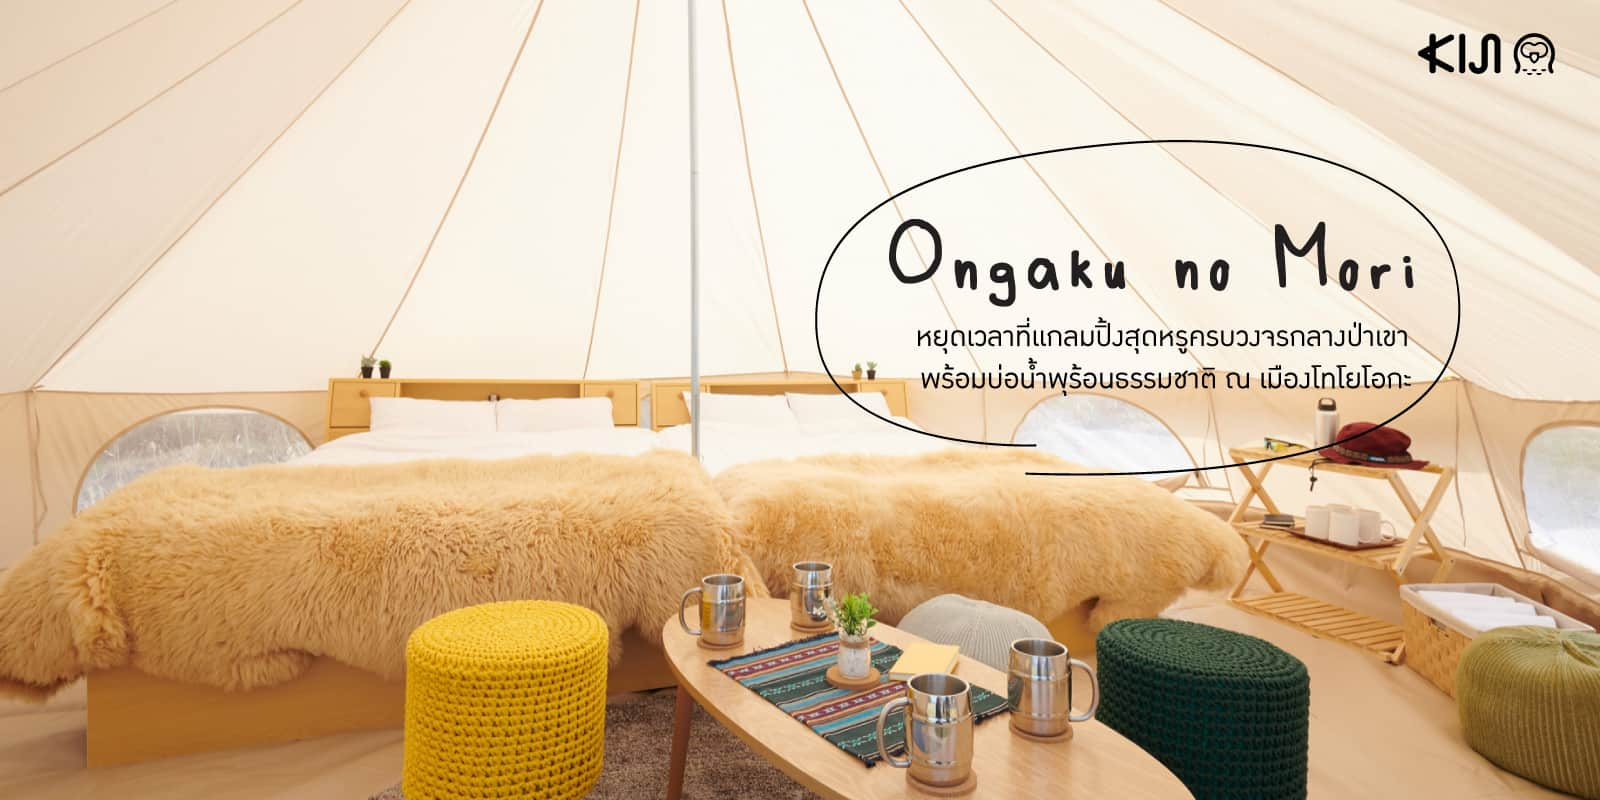 Ongaku no Mori ที่พักเฮียวโงะ โทโยโอกะ